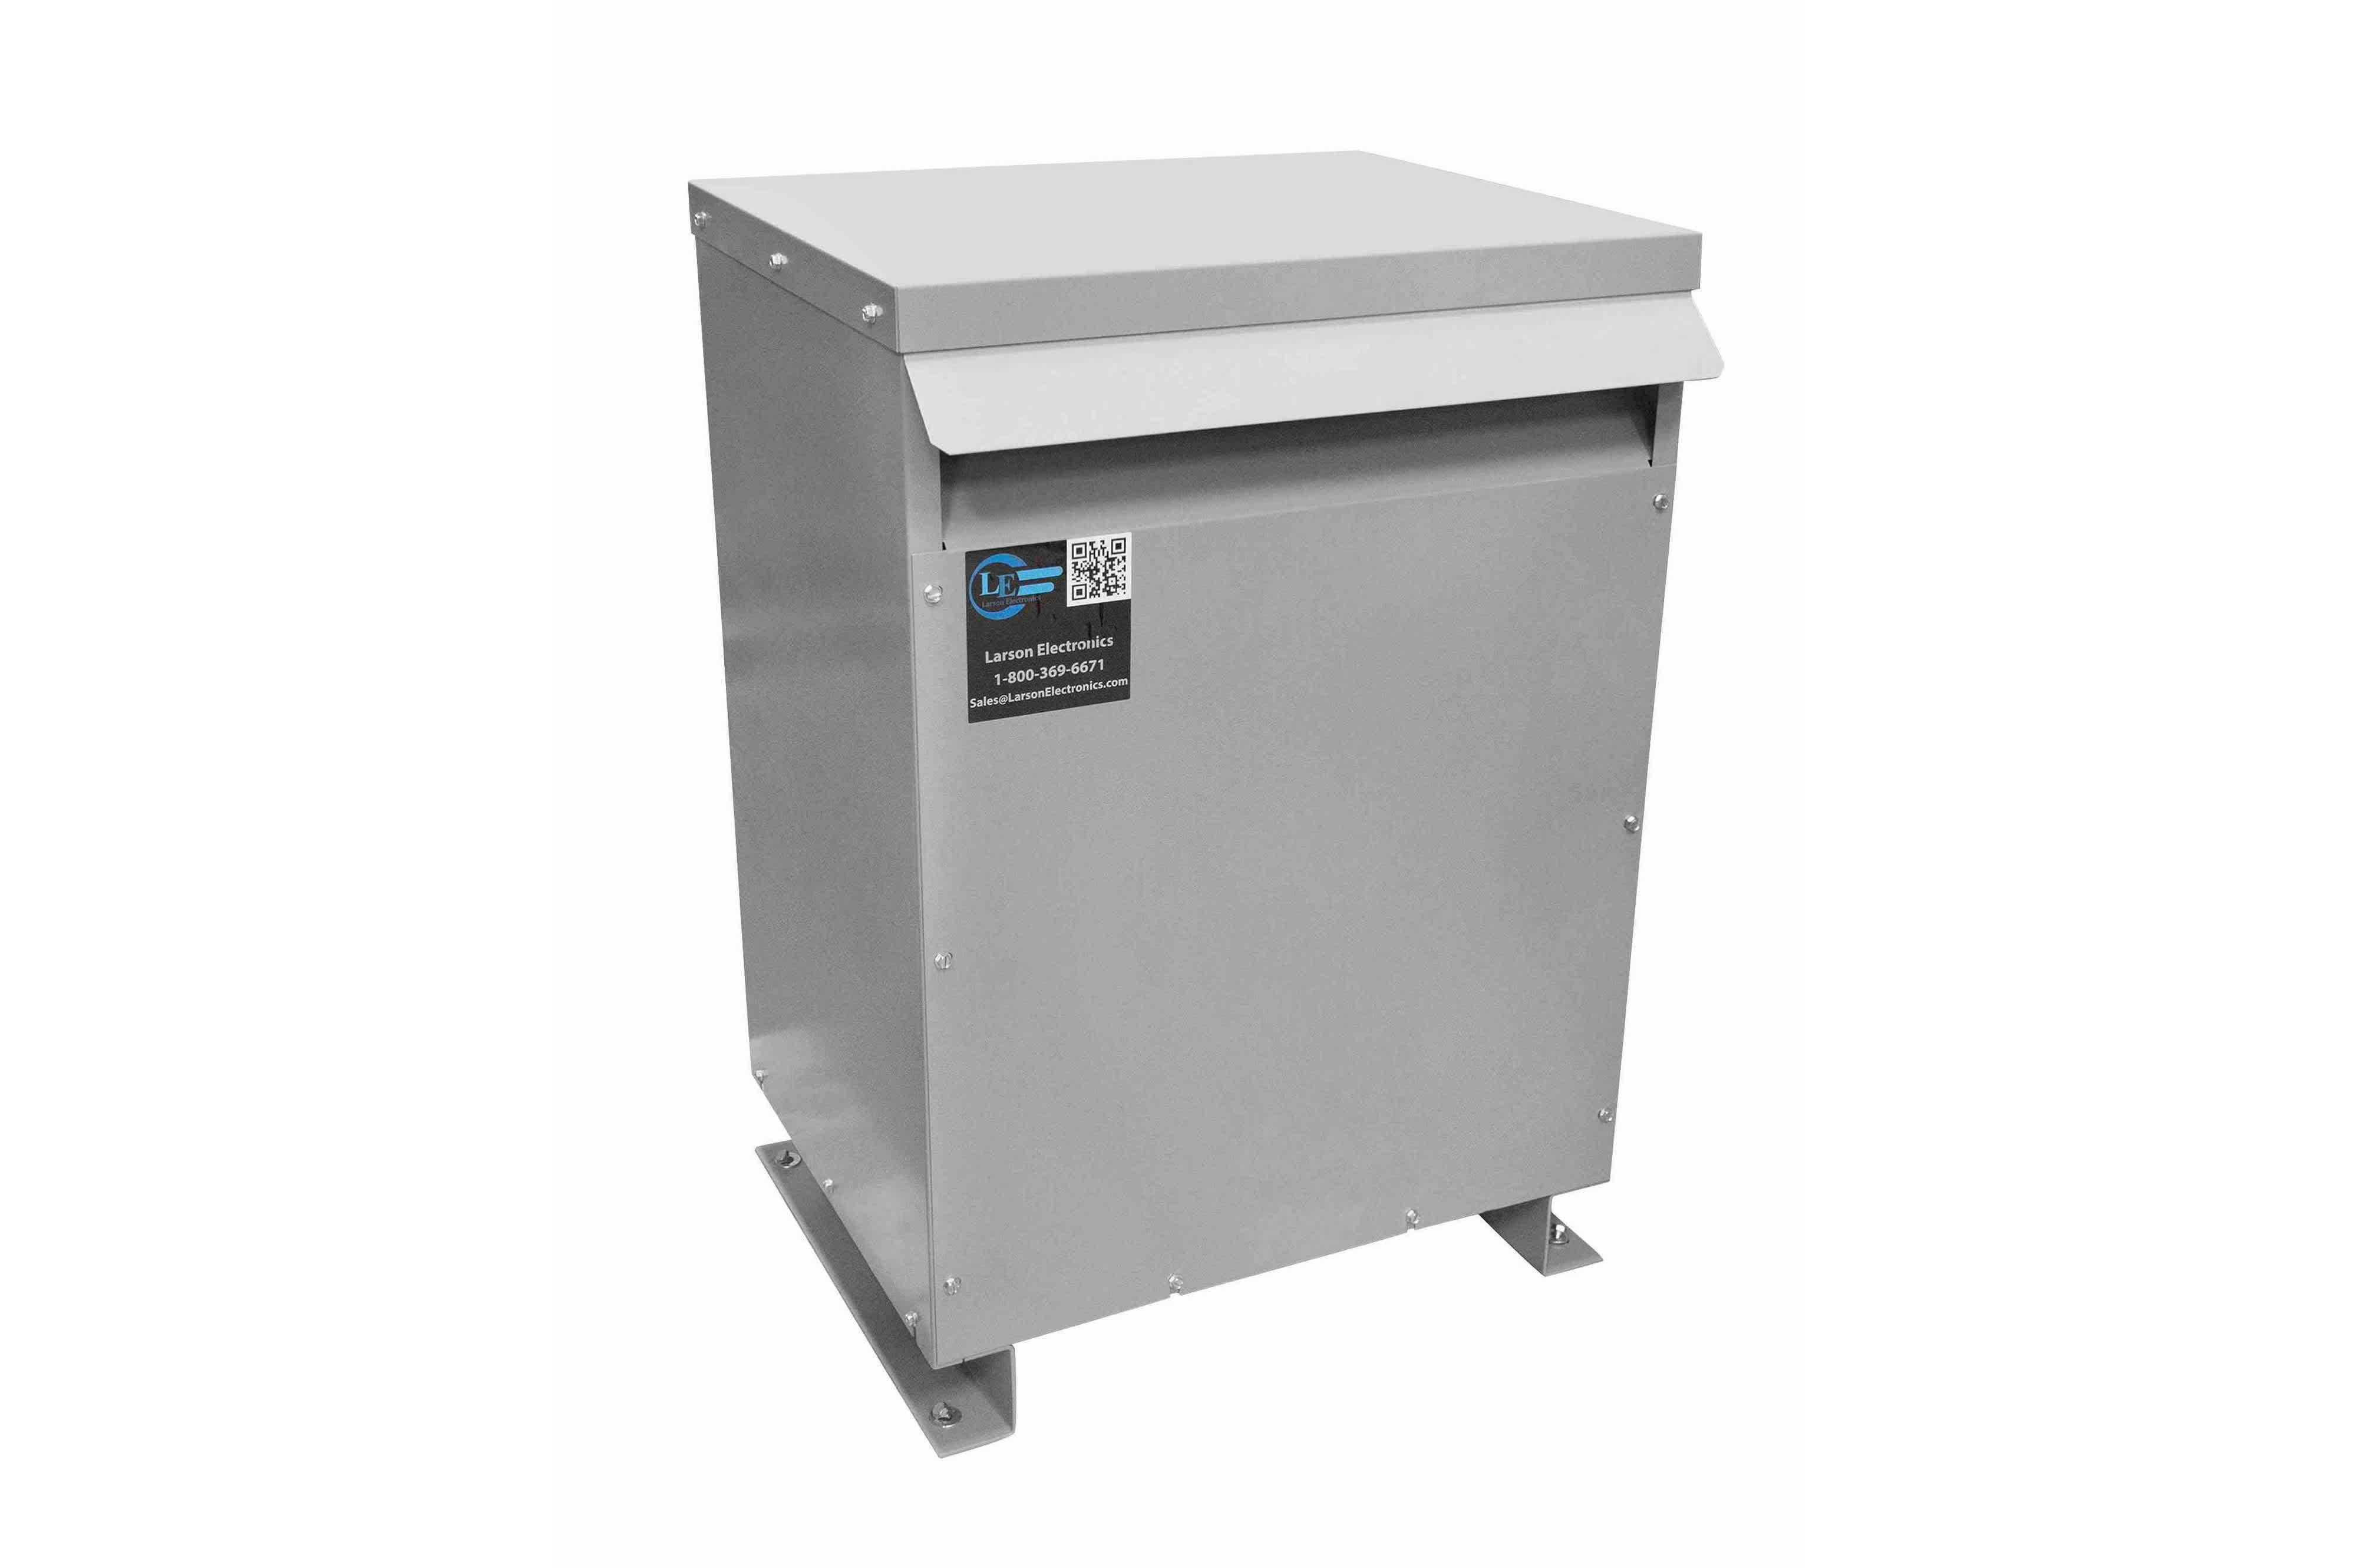 15 kVA 3PH DOE Transformer, 220V Delta Primary, 208Y/120 Wye-N Secondary, N3R, Ventilated, 60 Hz